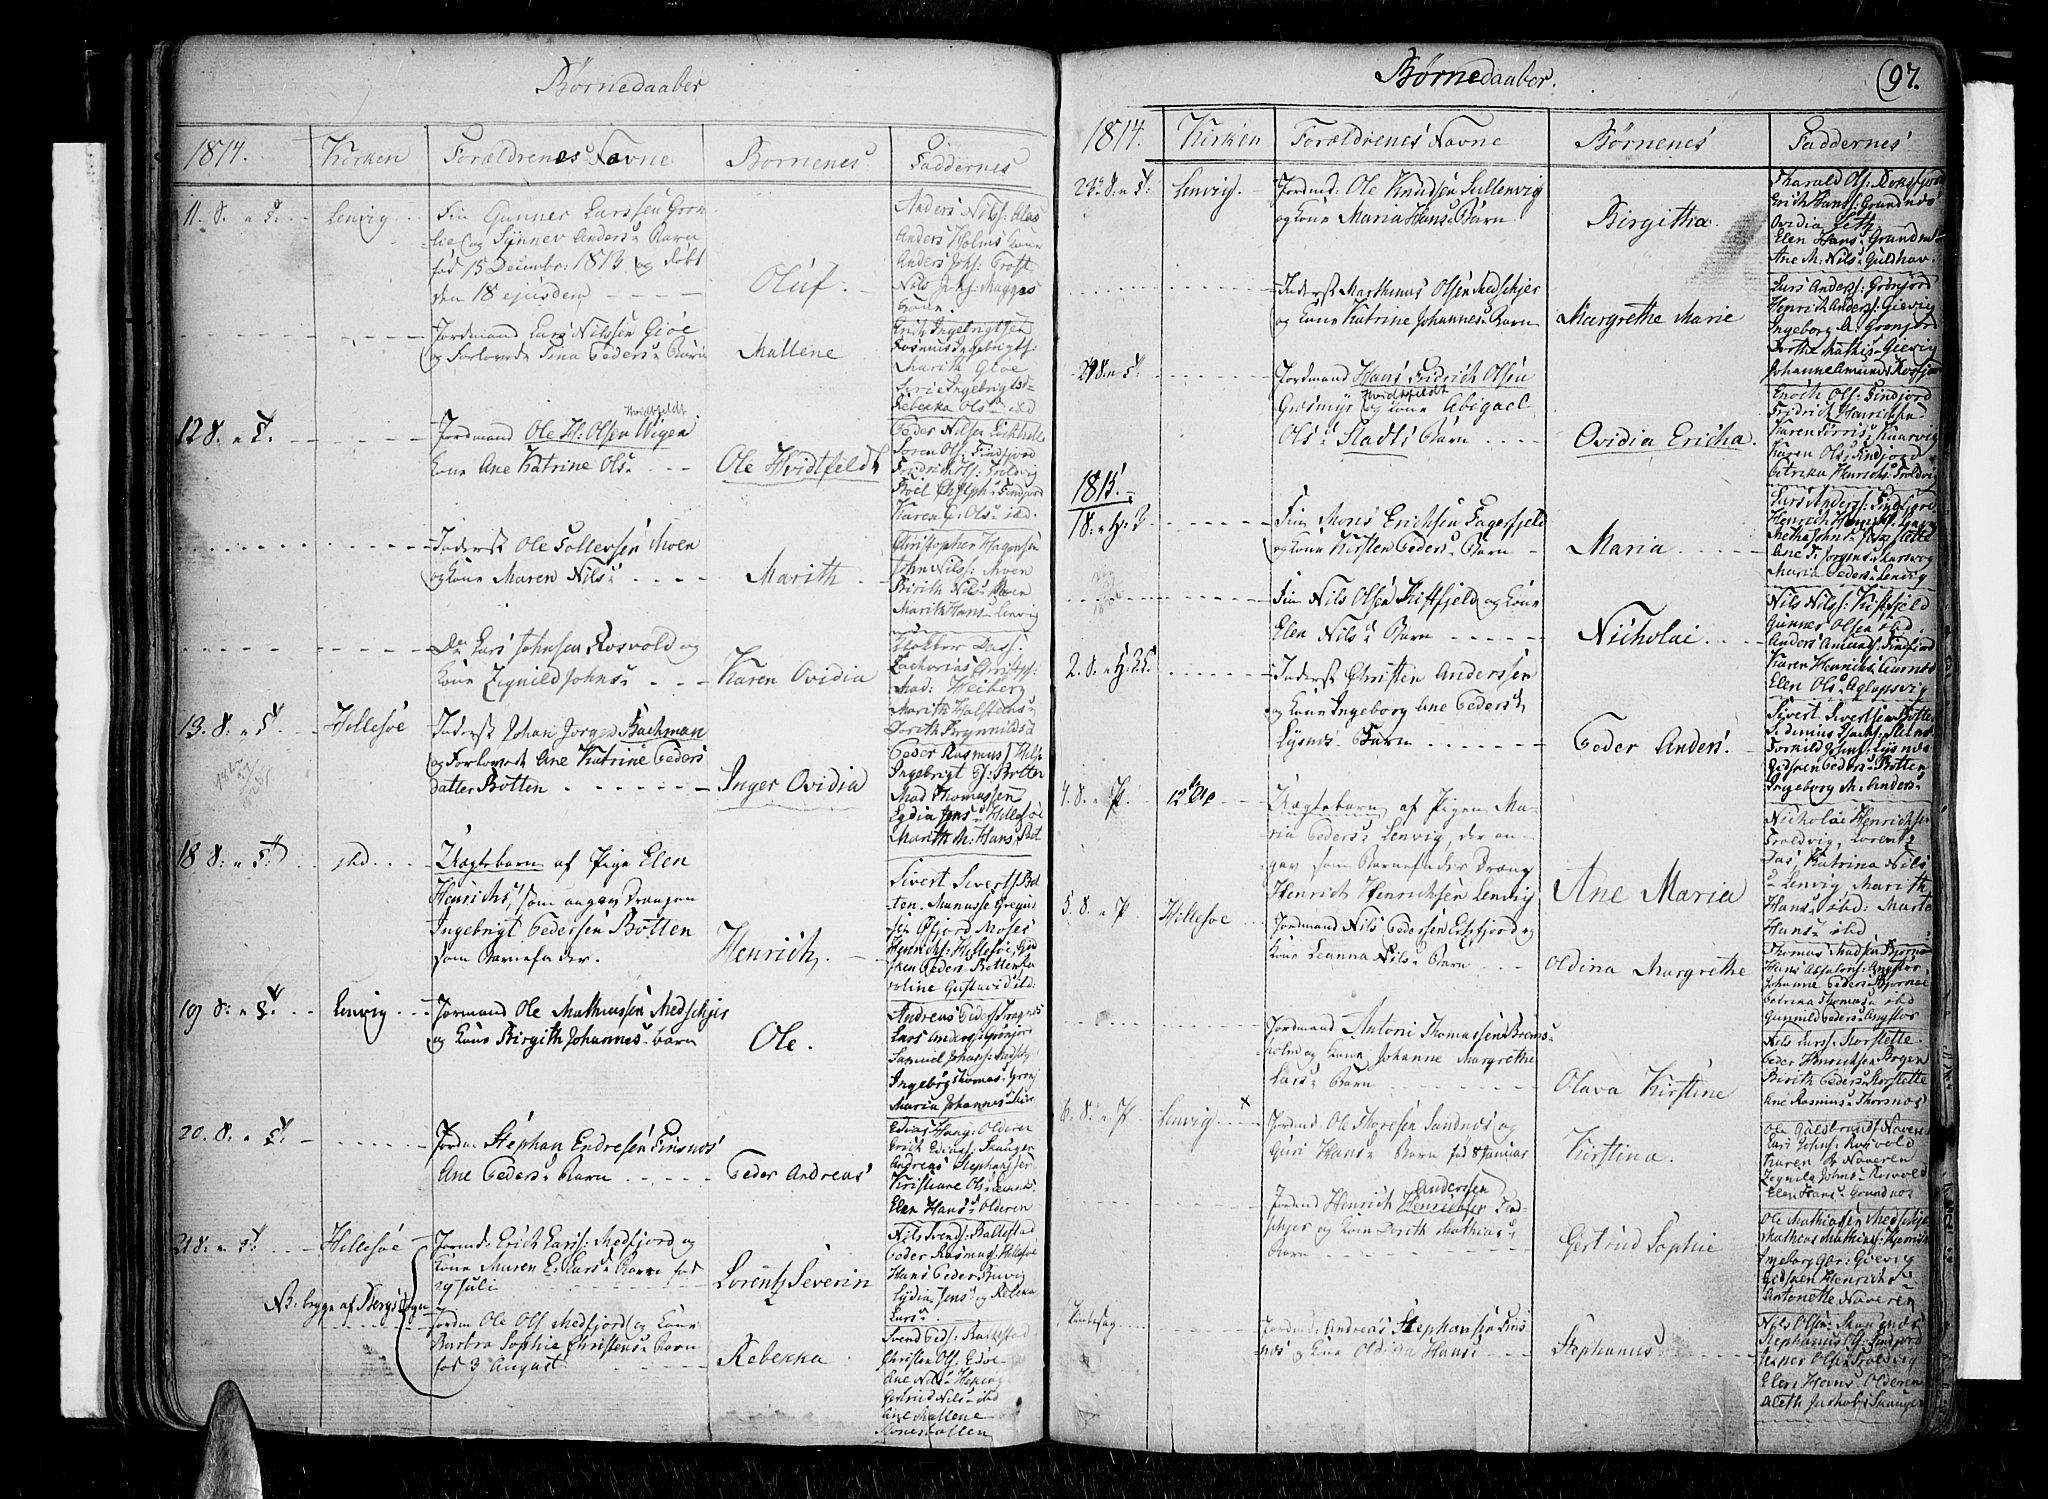 SATØ, Lenvik sokneprestembete, H/Ha/Haa/L0002kirke: Ministerialbok nr. 2, 1784-1820, s. 97